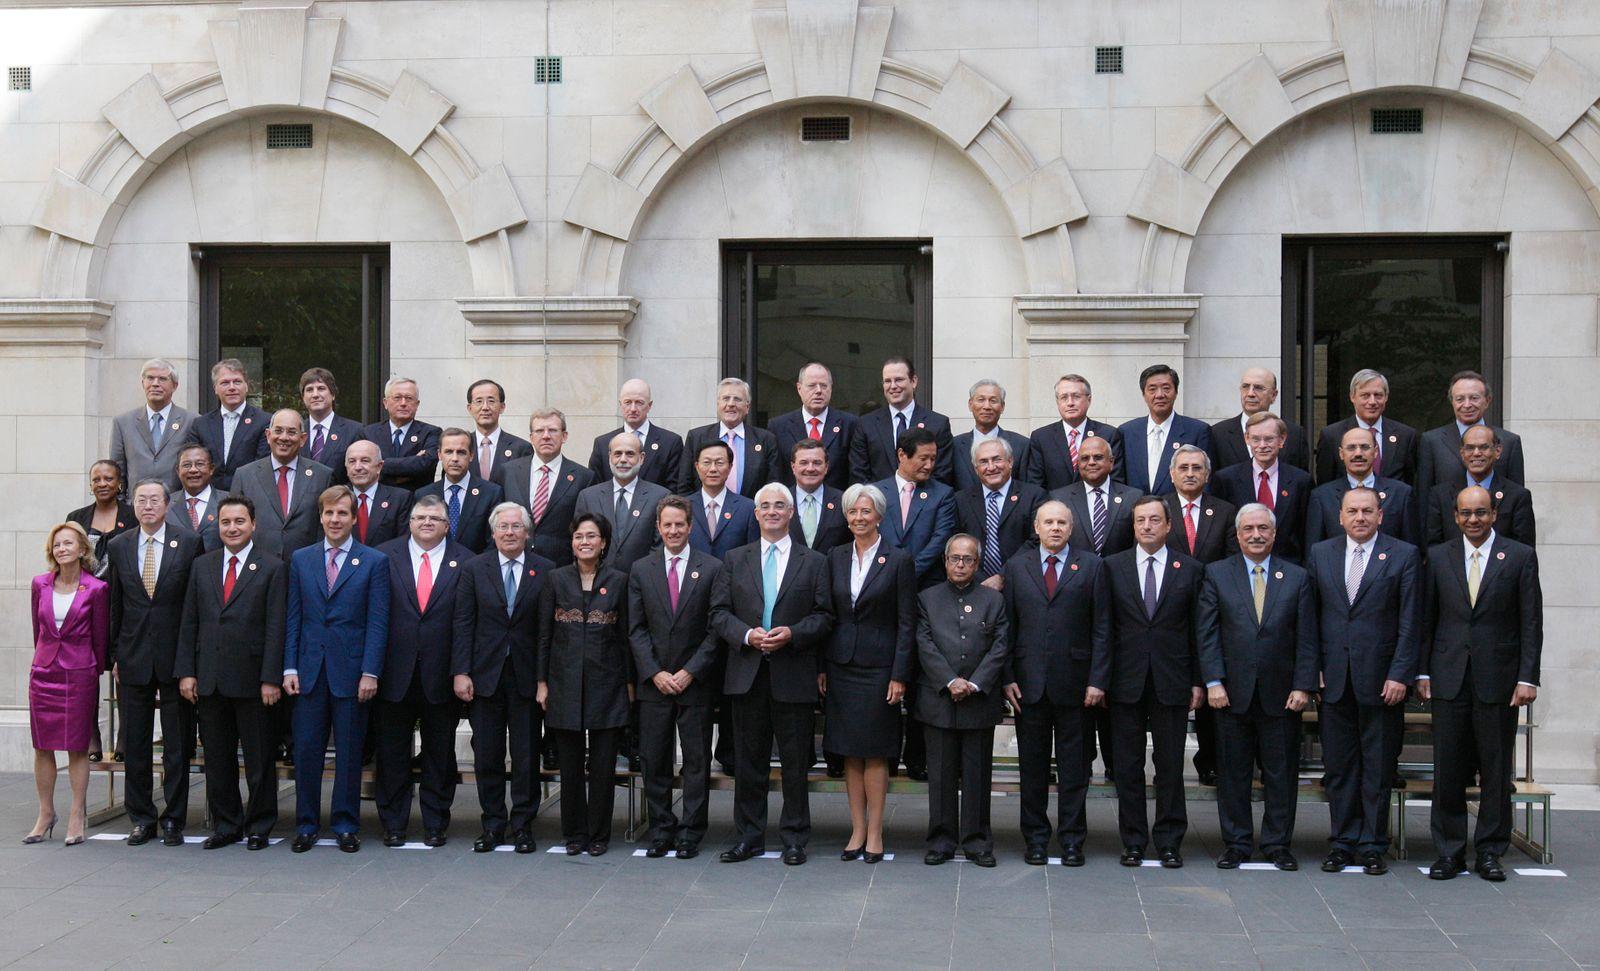 london g-20 2009